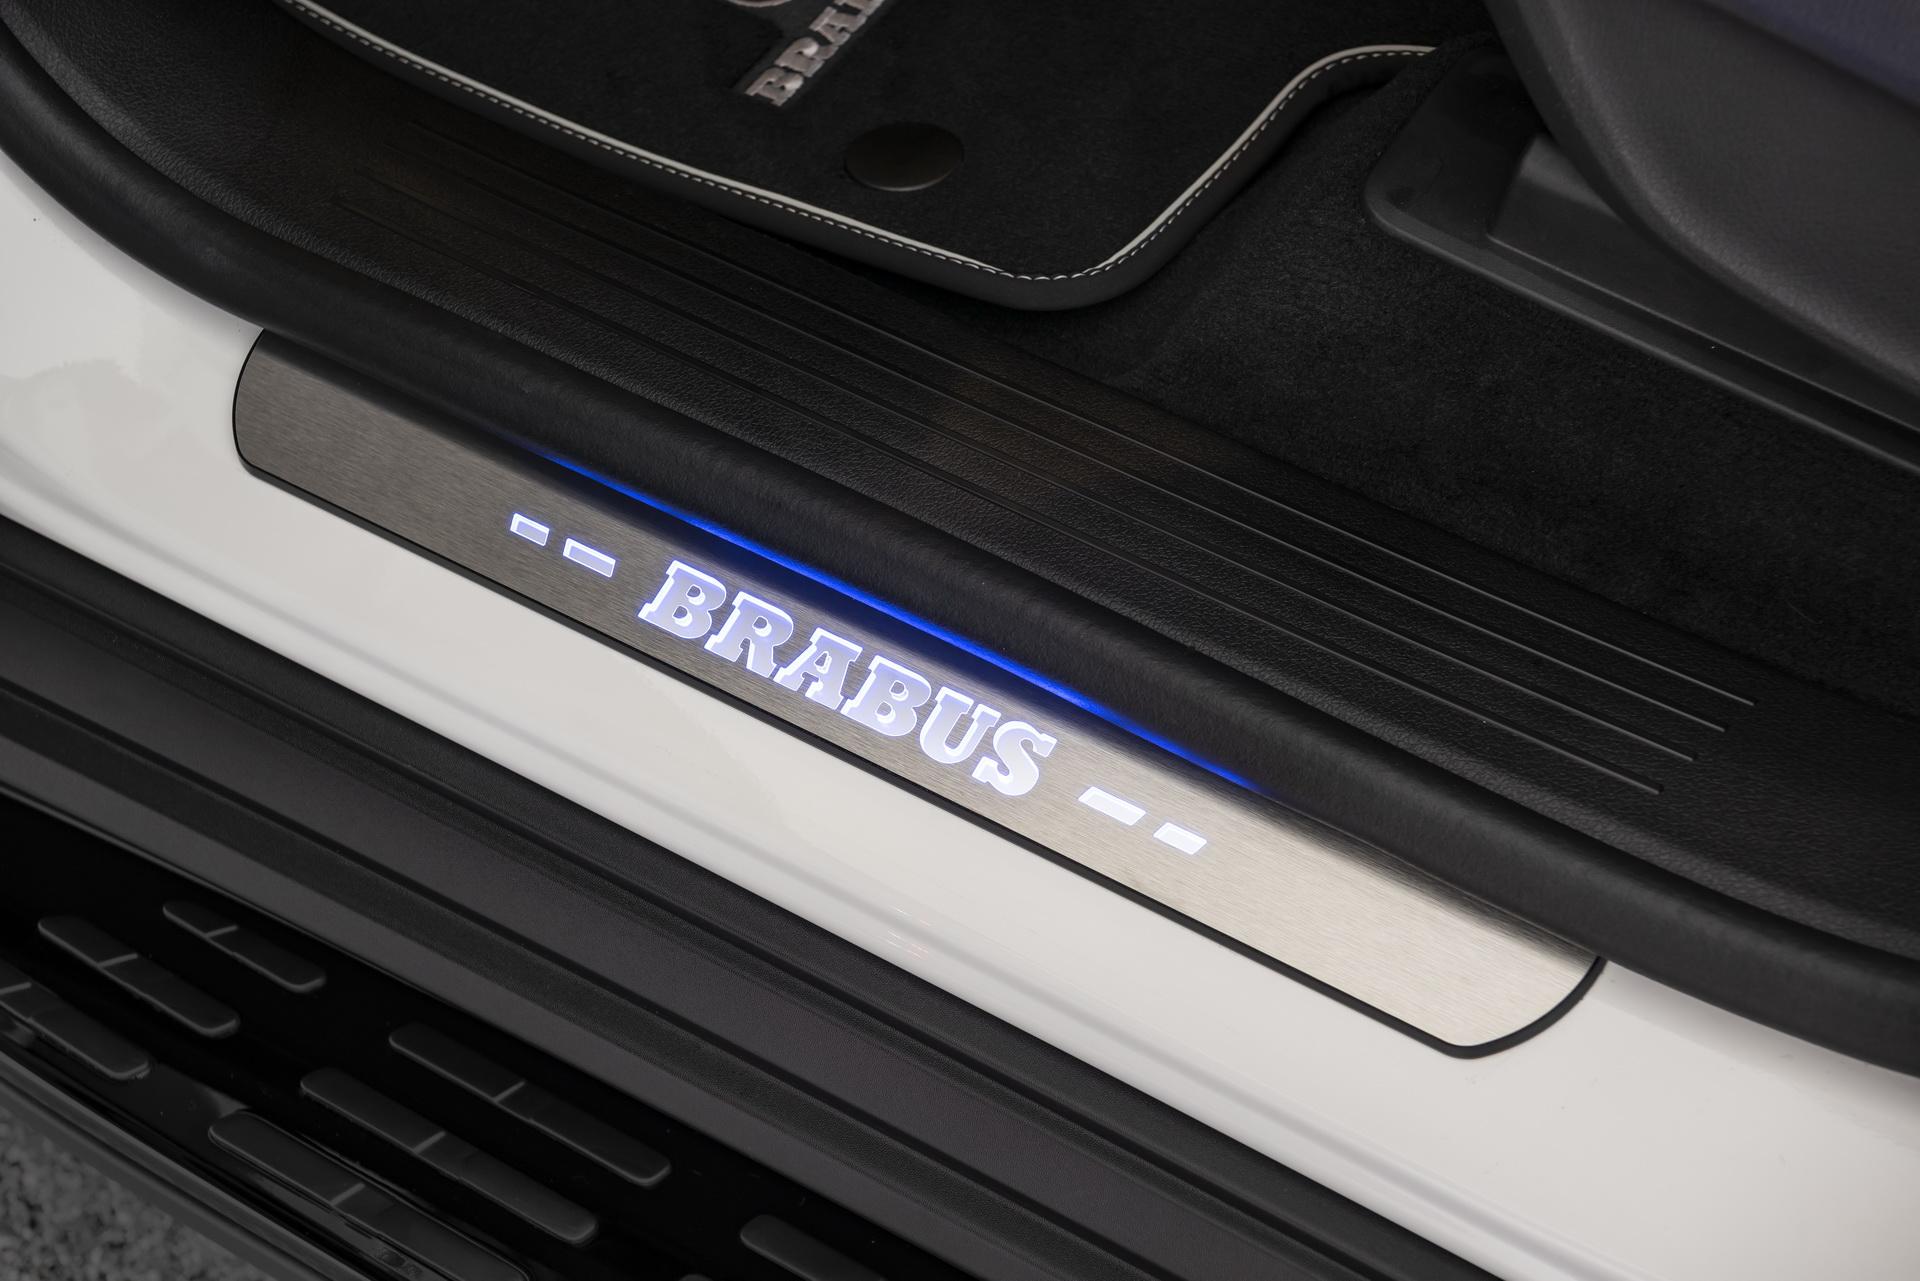 2020-mercedes-benz-gls-tuning-brabus-21.jpeg